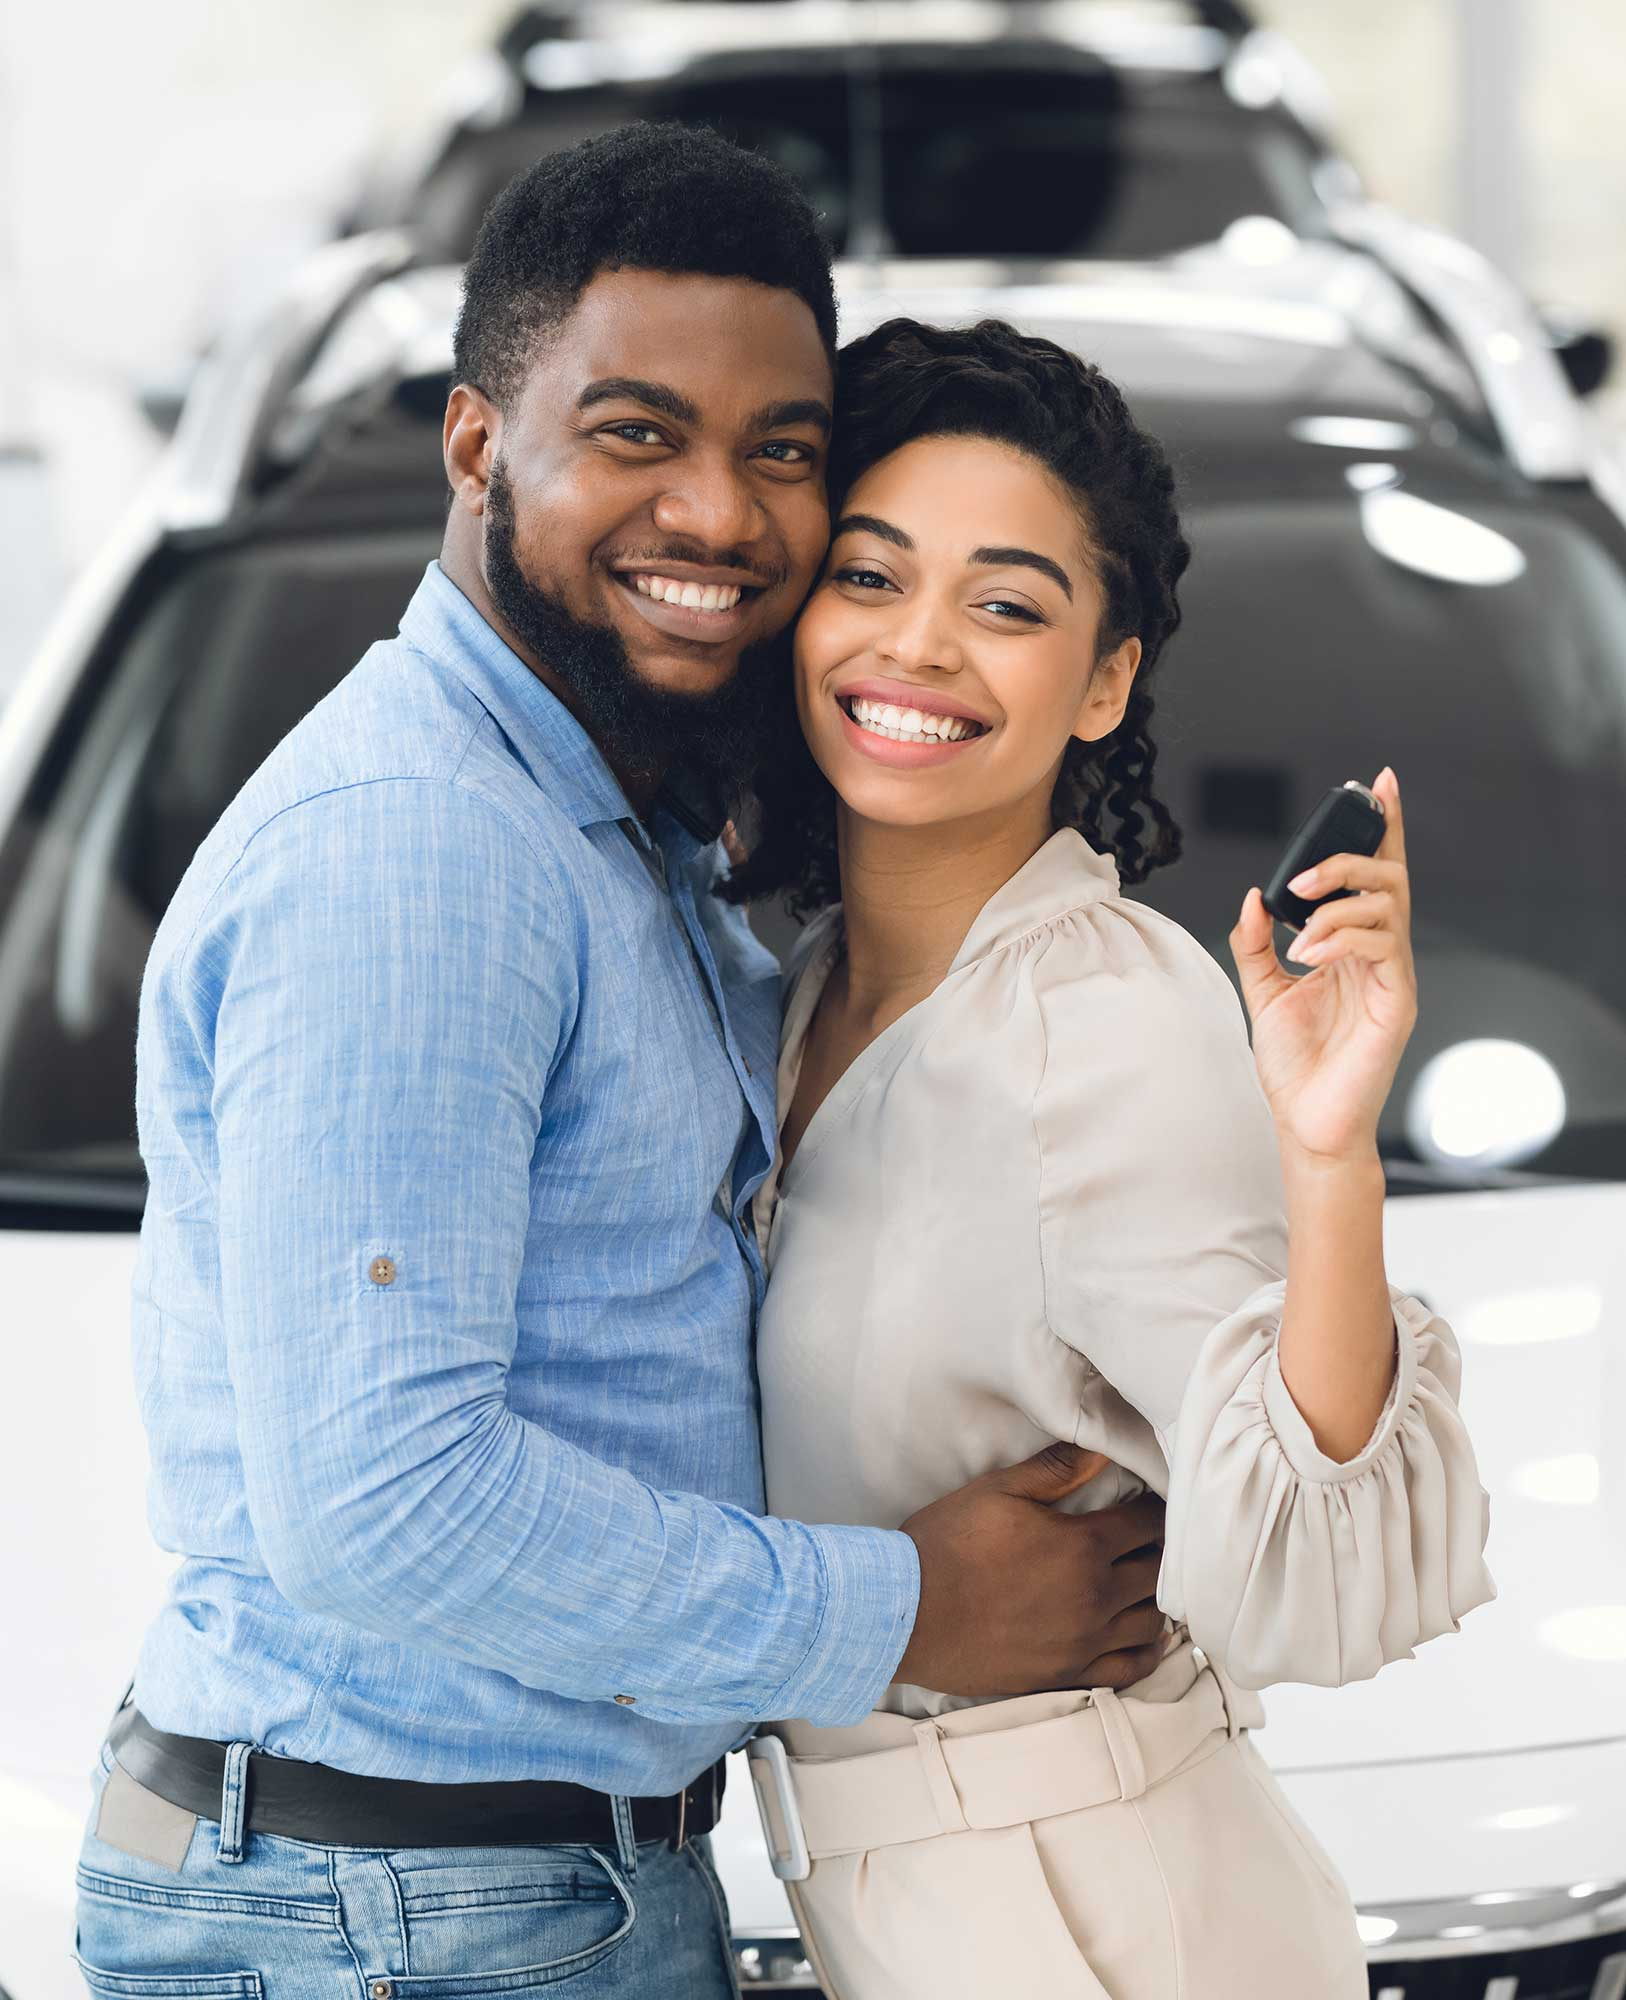 PrimeWay New & Used Auto Loans